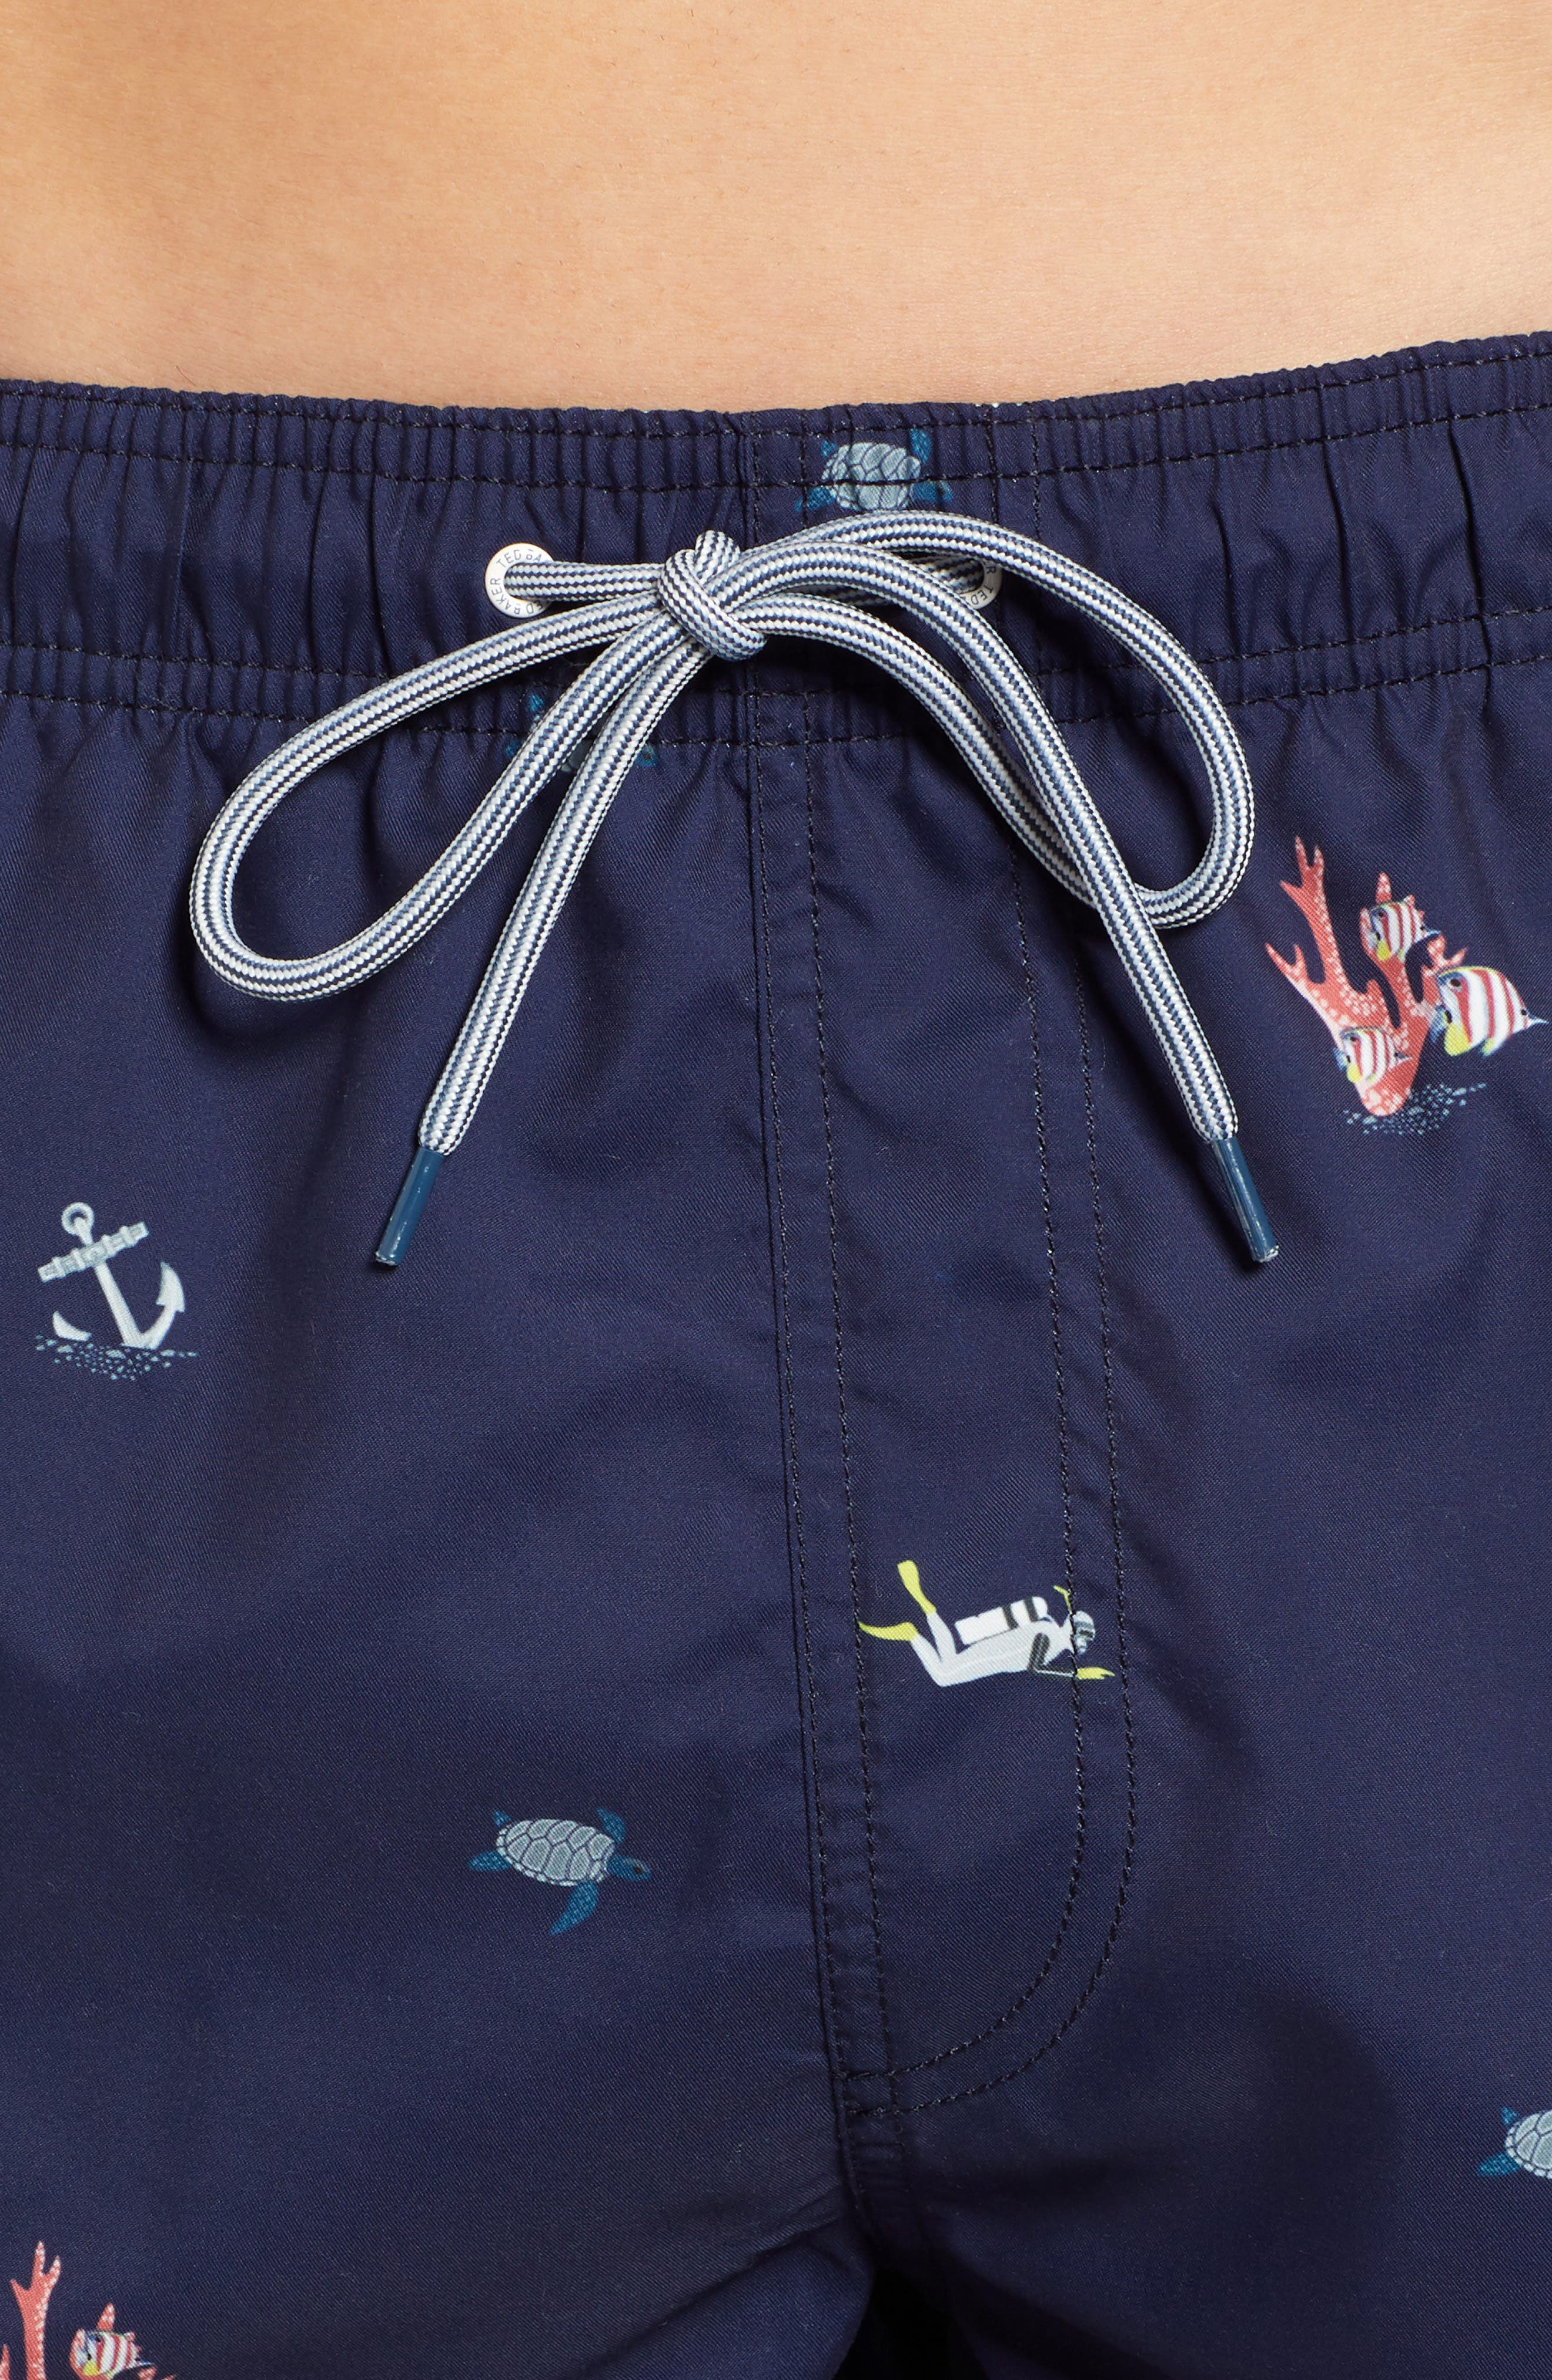 Kelpe Slim Fit Diver Swim Trunks,                             Alternate thumbnail 4, color,                             NAVY